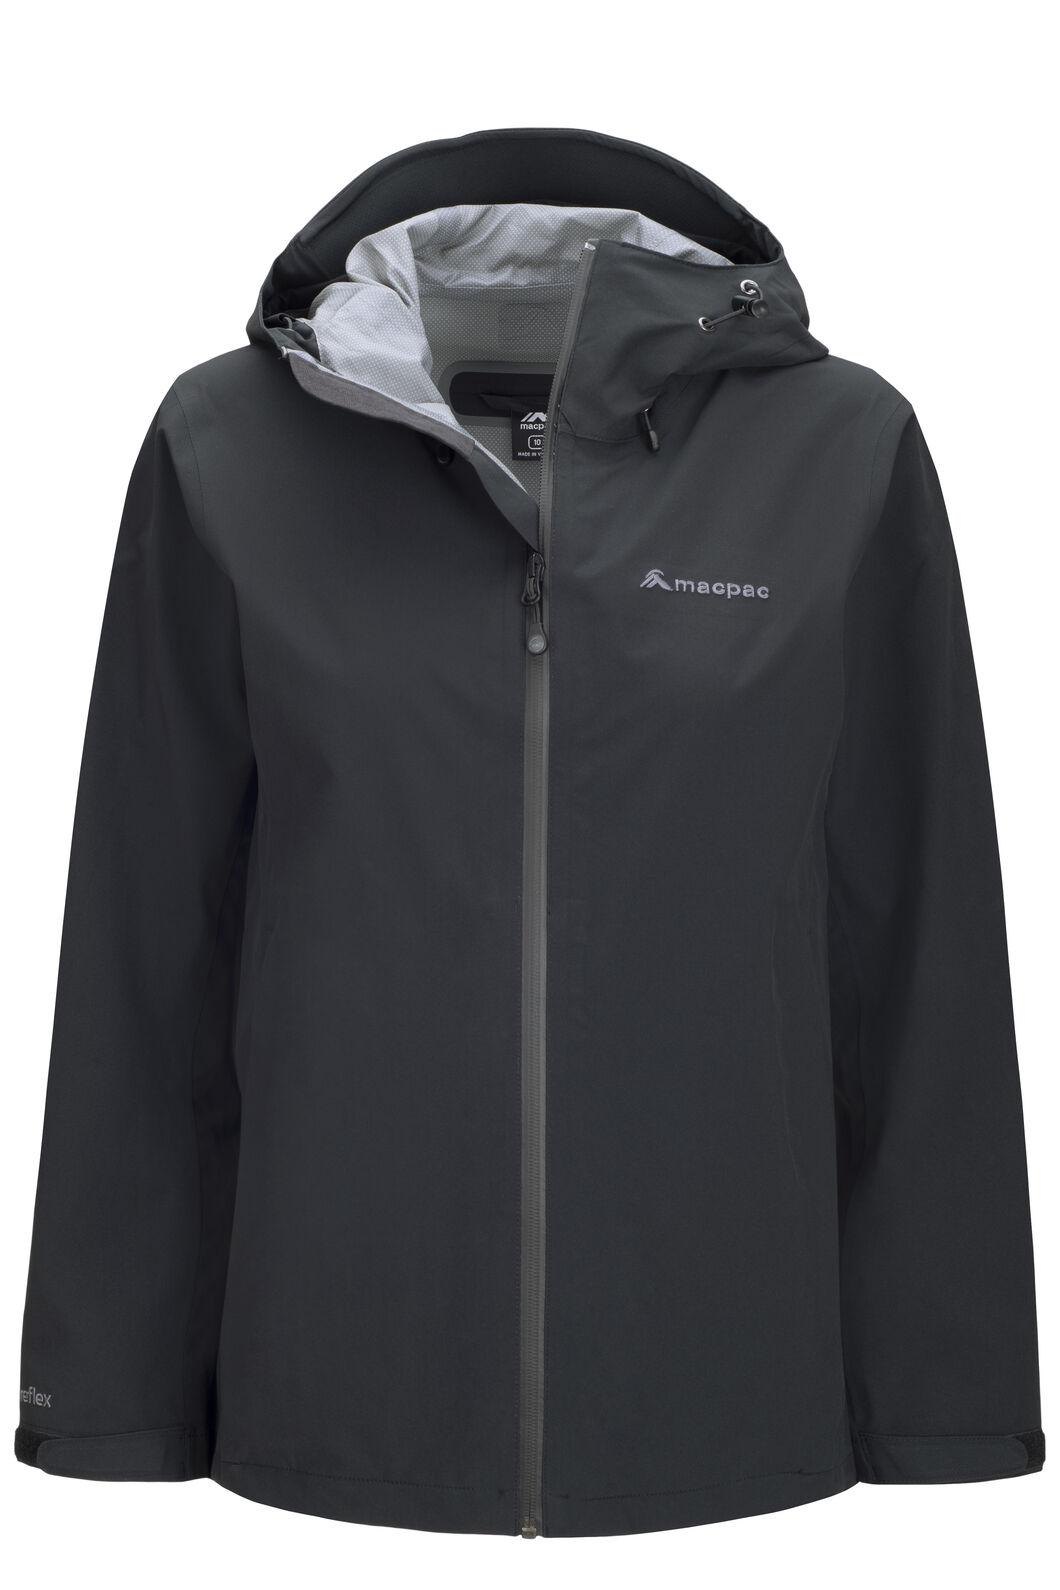 Macpac Women's Dispatch Rain Jacket, Black, hi-res